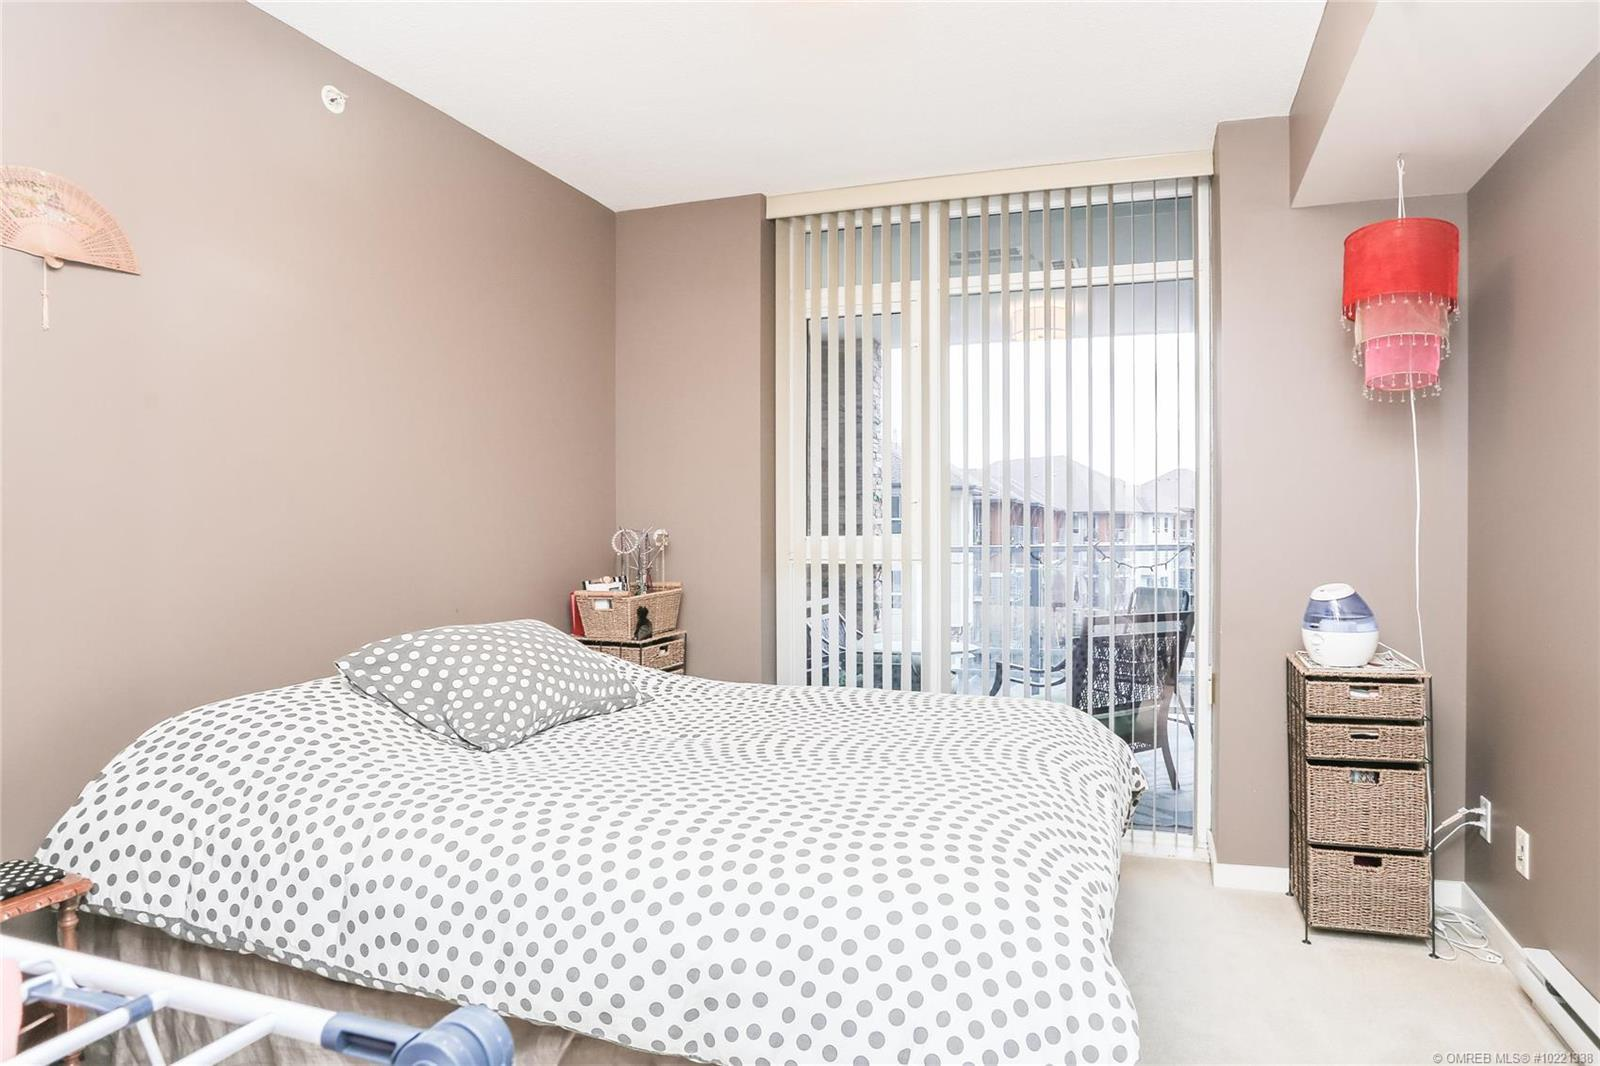 #404 1075 Sunset Drive, - Kelowna Apartment for sale, 1 Bedroom (10221338) - #10